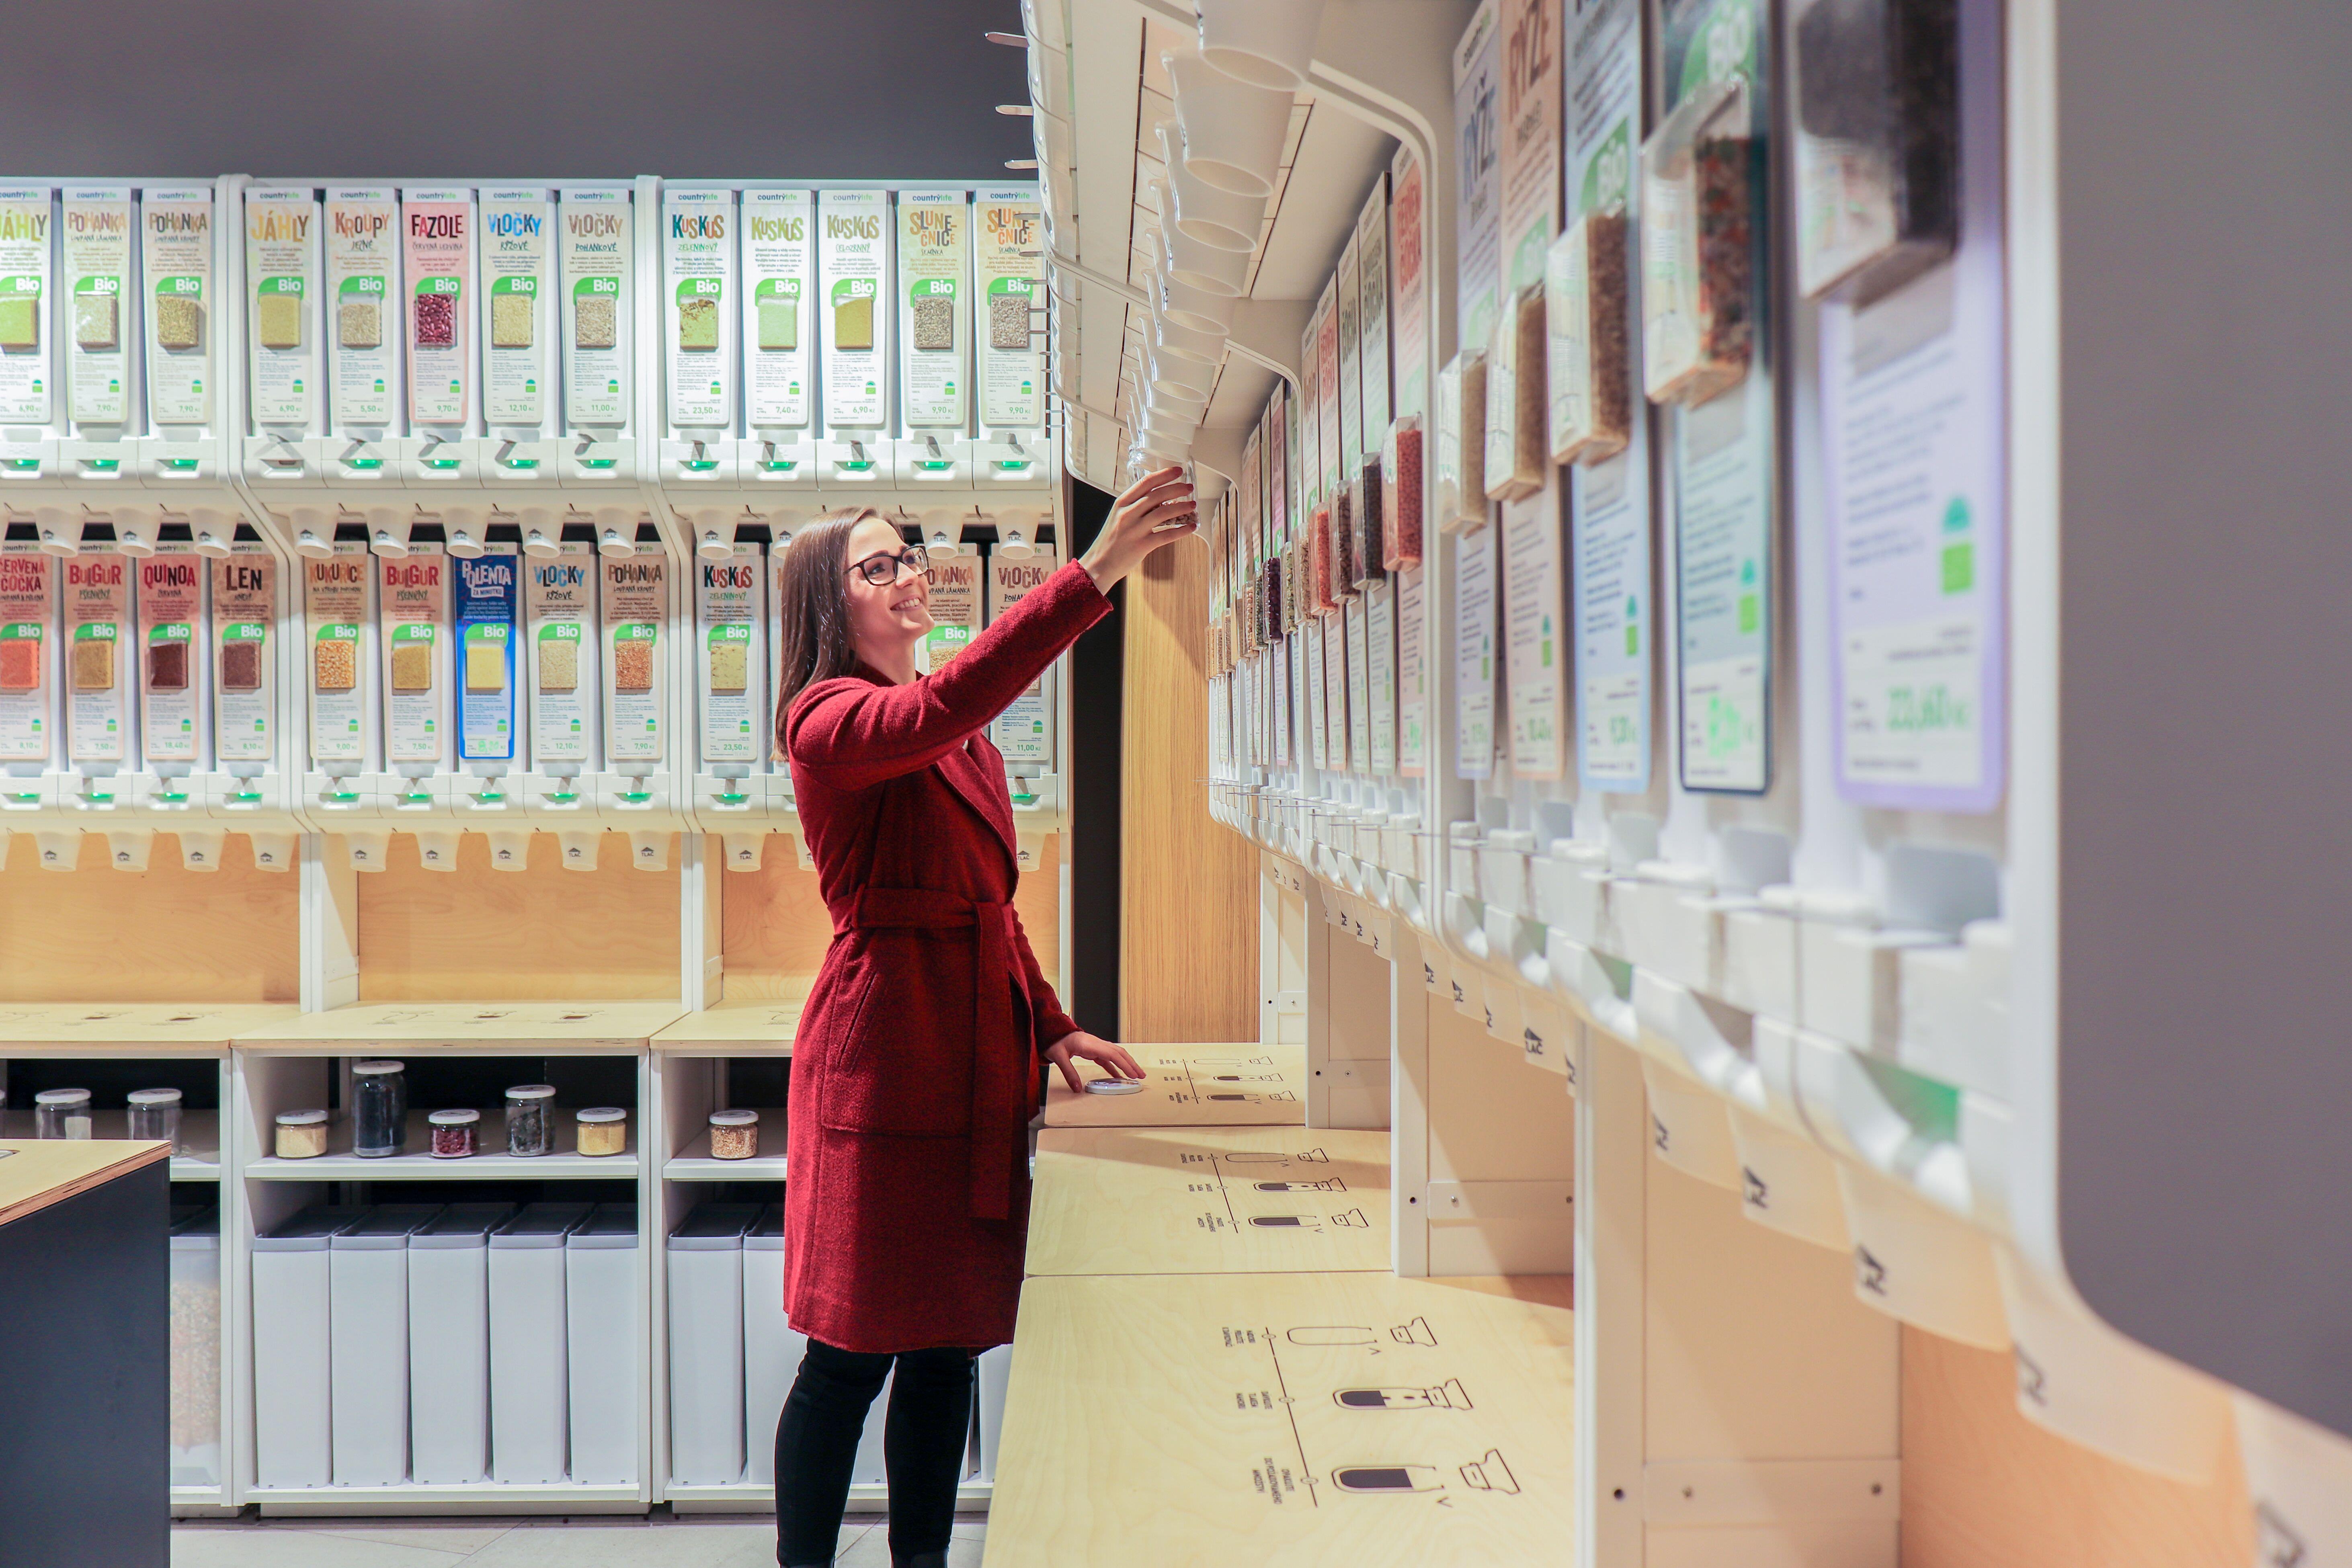 Gallery MIWA - Smart Reusable Packaging 3